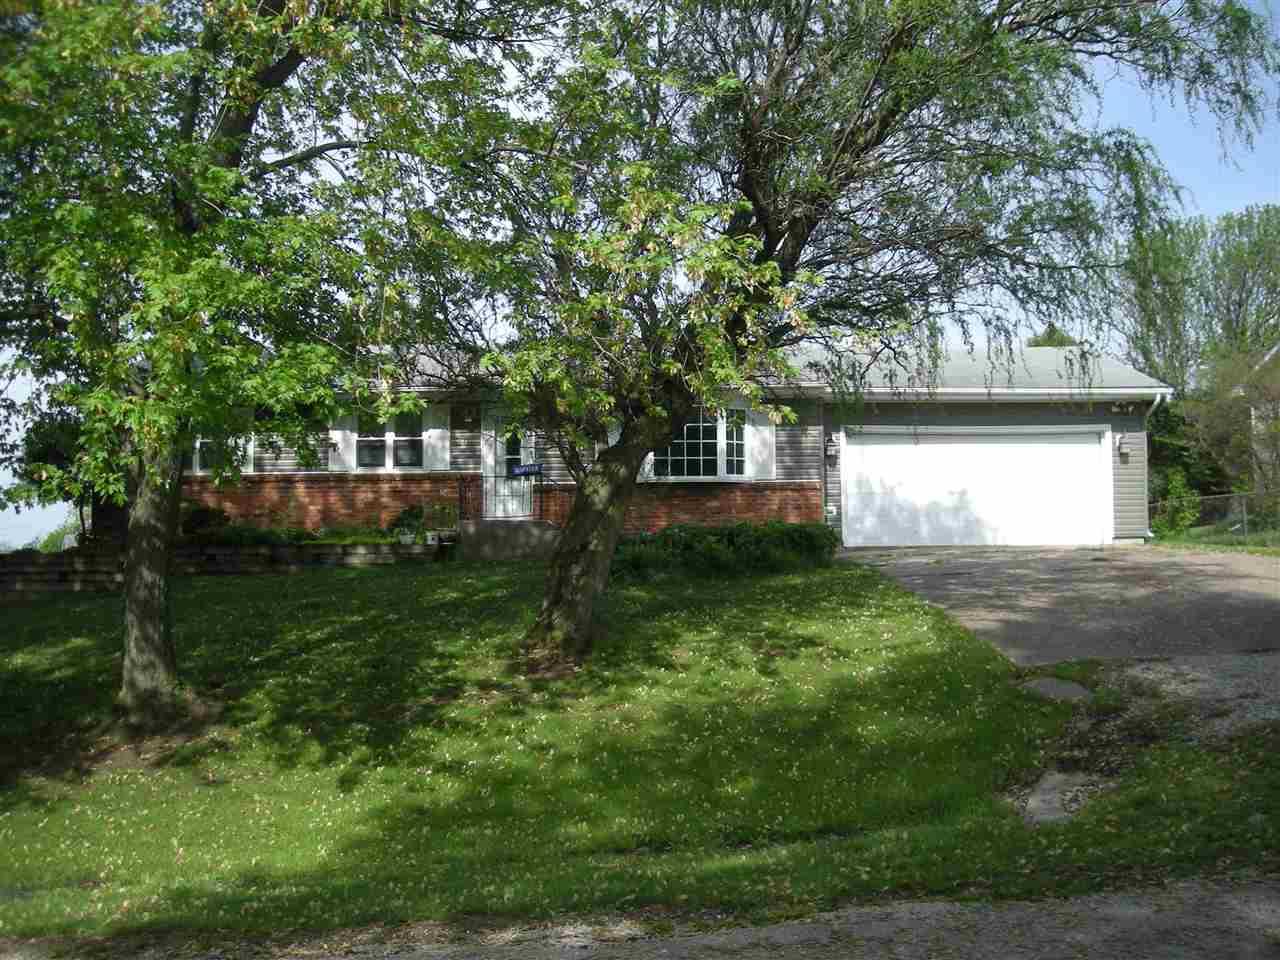 Real Estate for Sale, ListingId: 33276004, Orion,IL61273